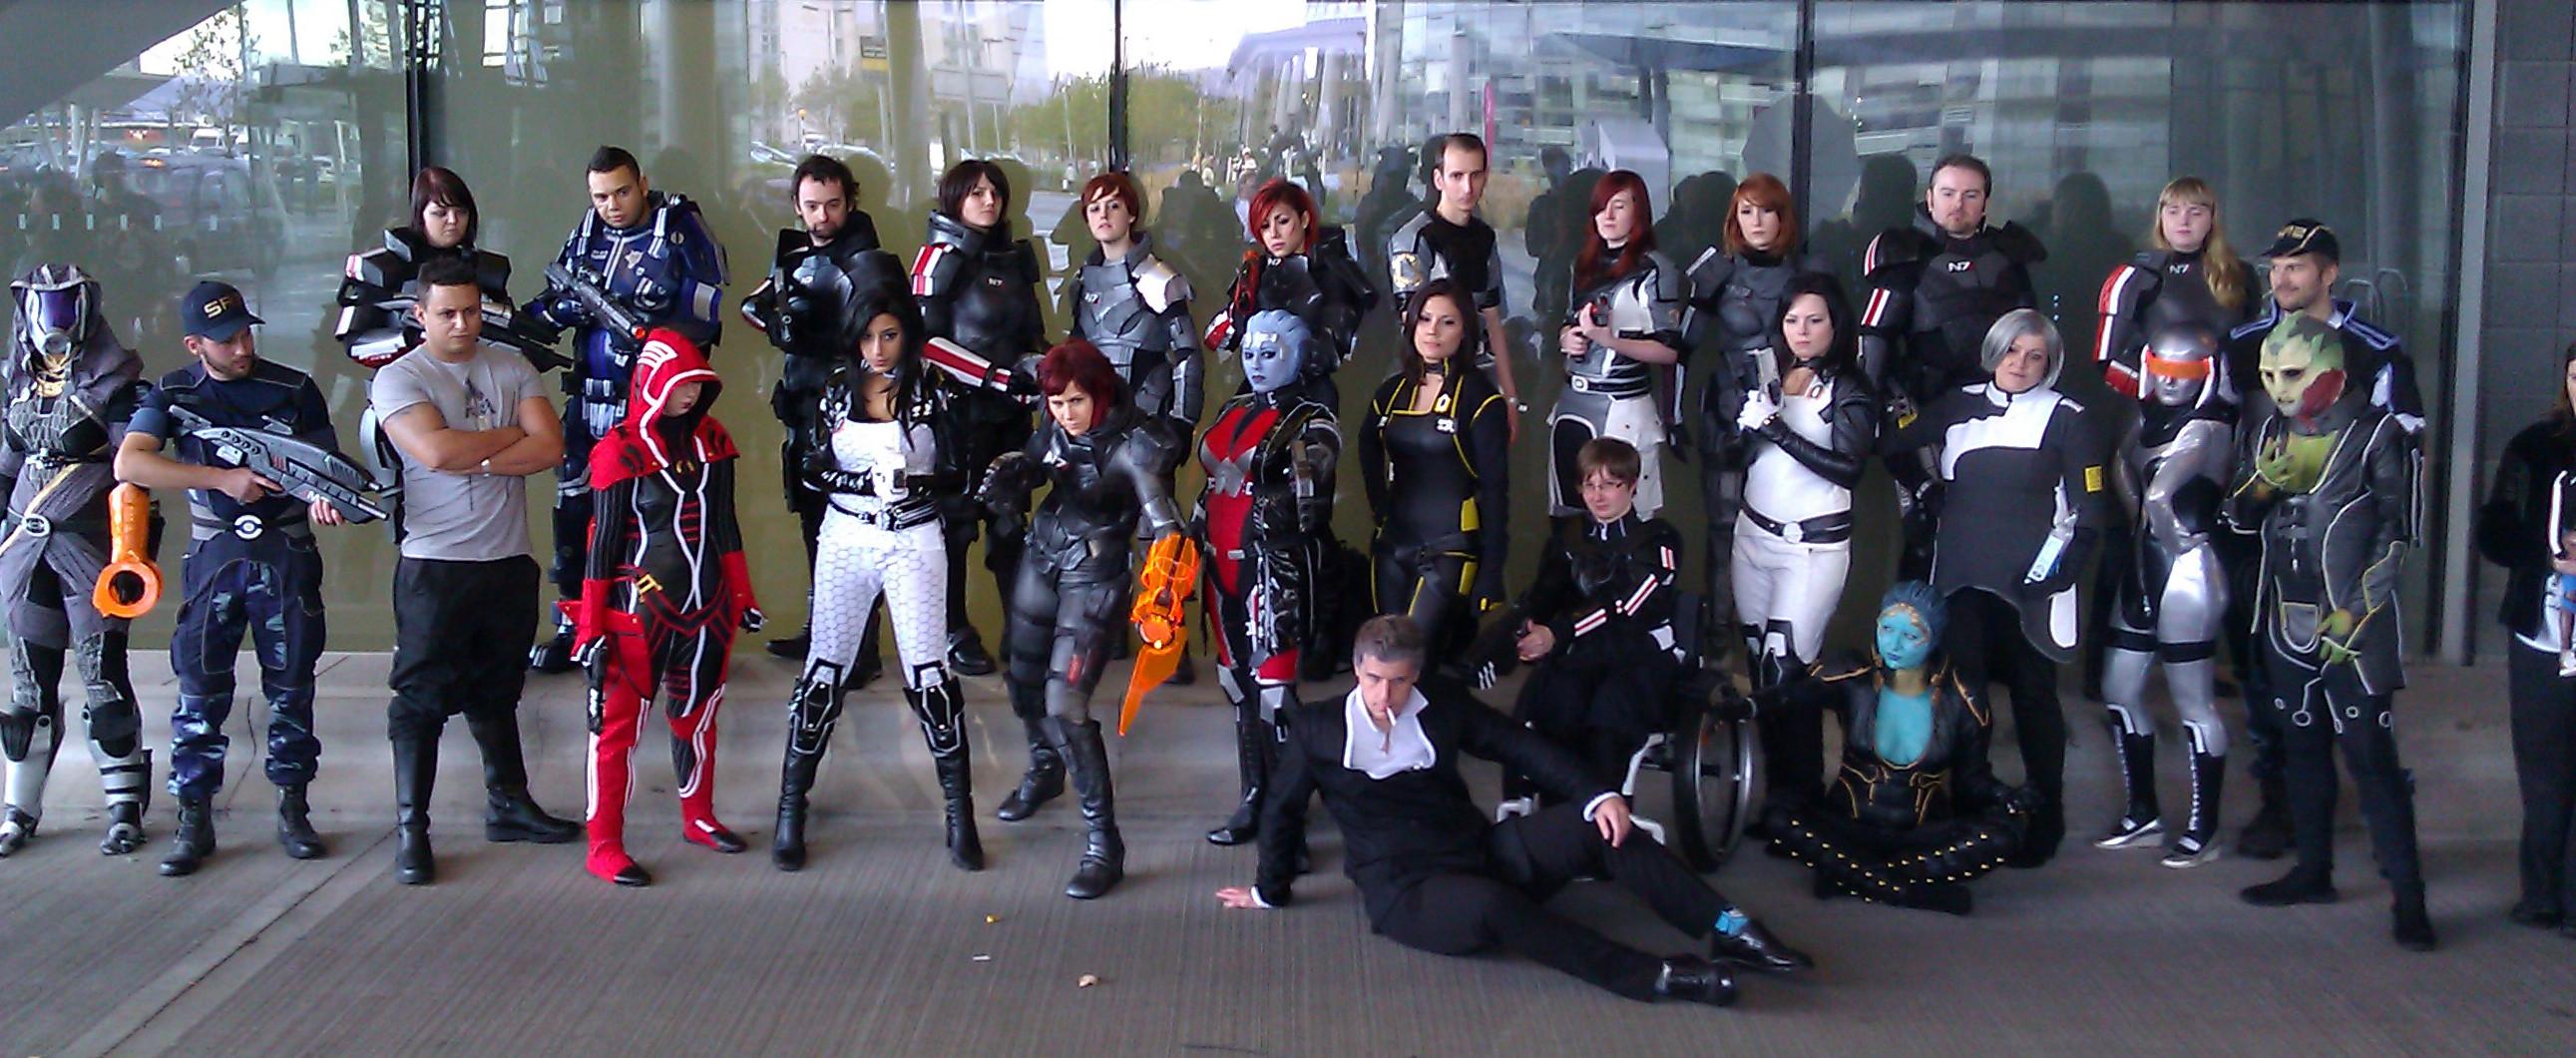 MCM BioWare cosplayers 2012